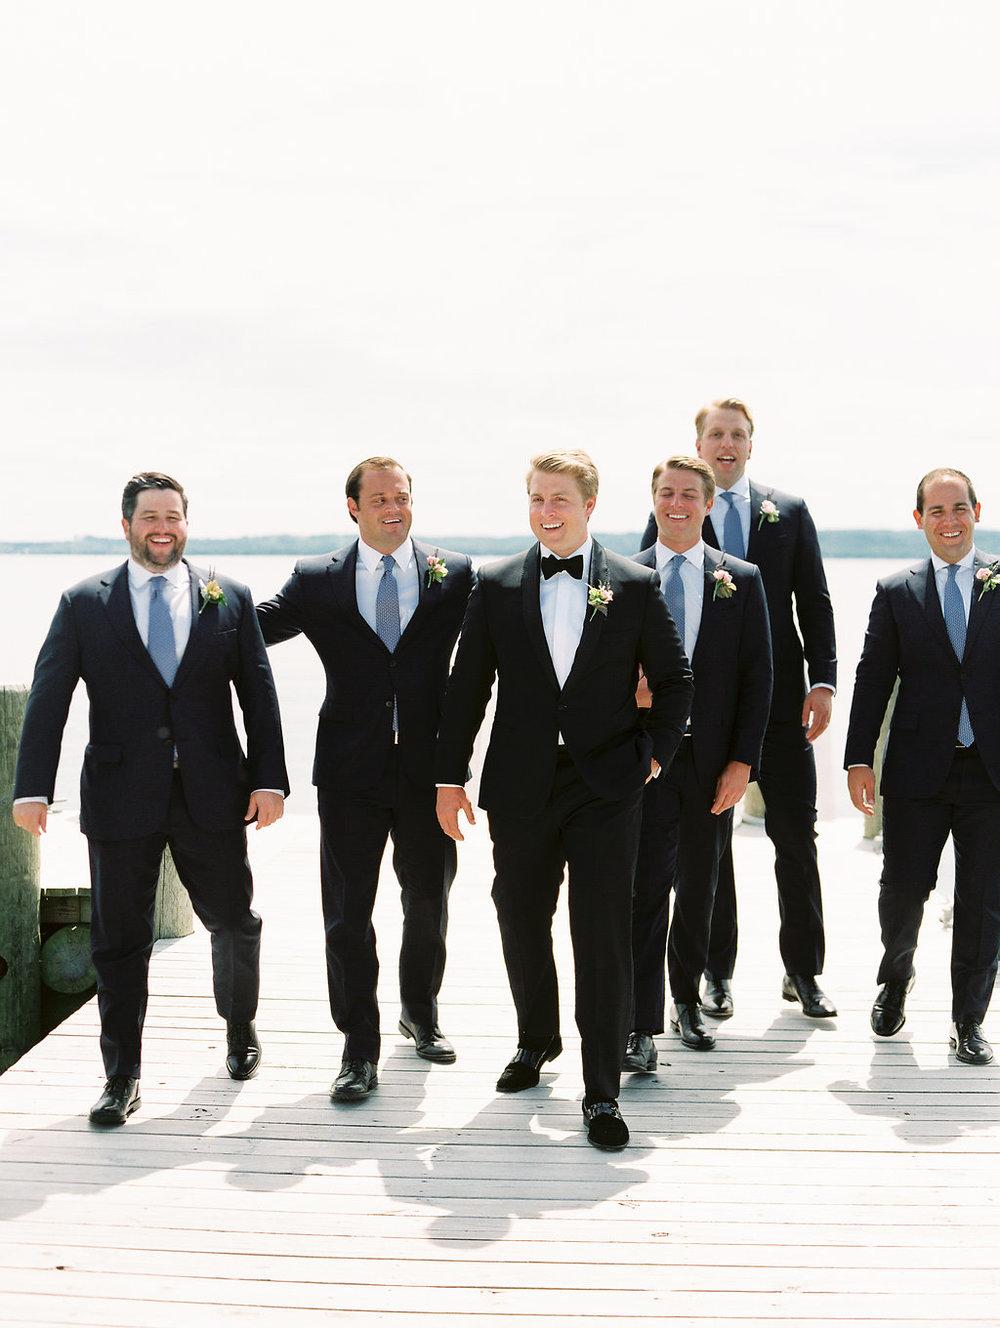 Coffman+Wedding+Bridal+Party-10.jpg